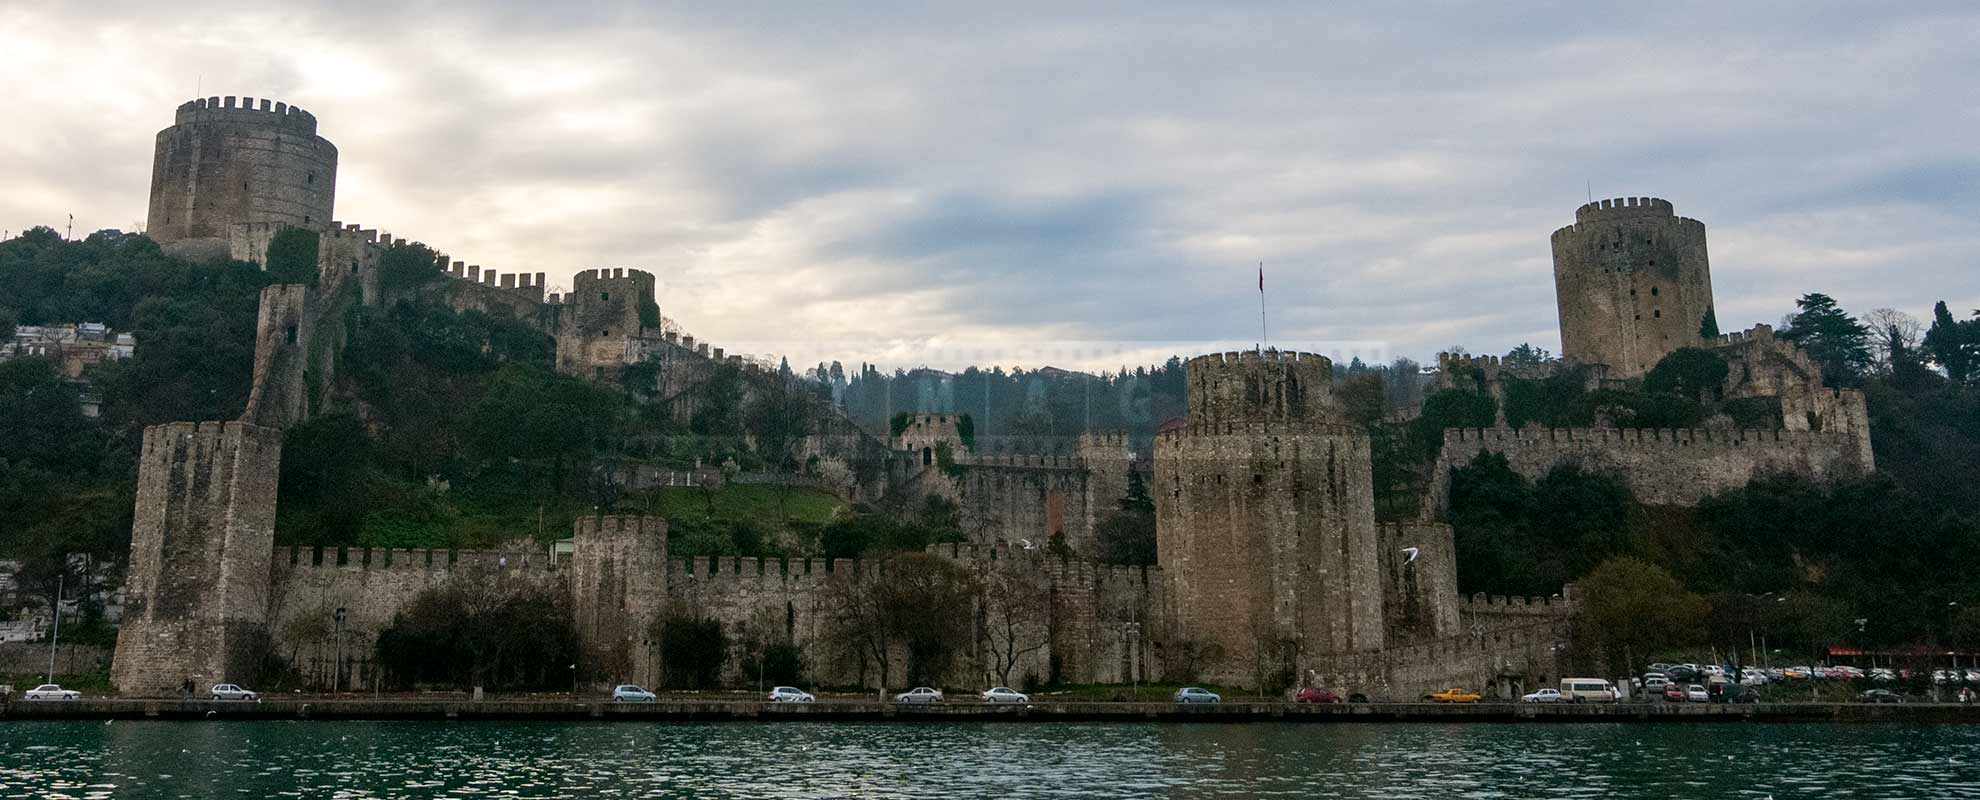 Rumeli Castle on the European side of the Bosphorus in Istanbul, Turkey